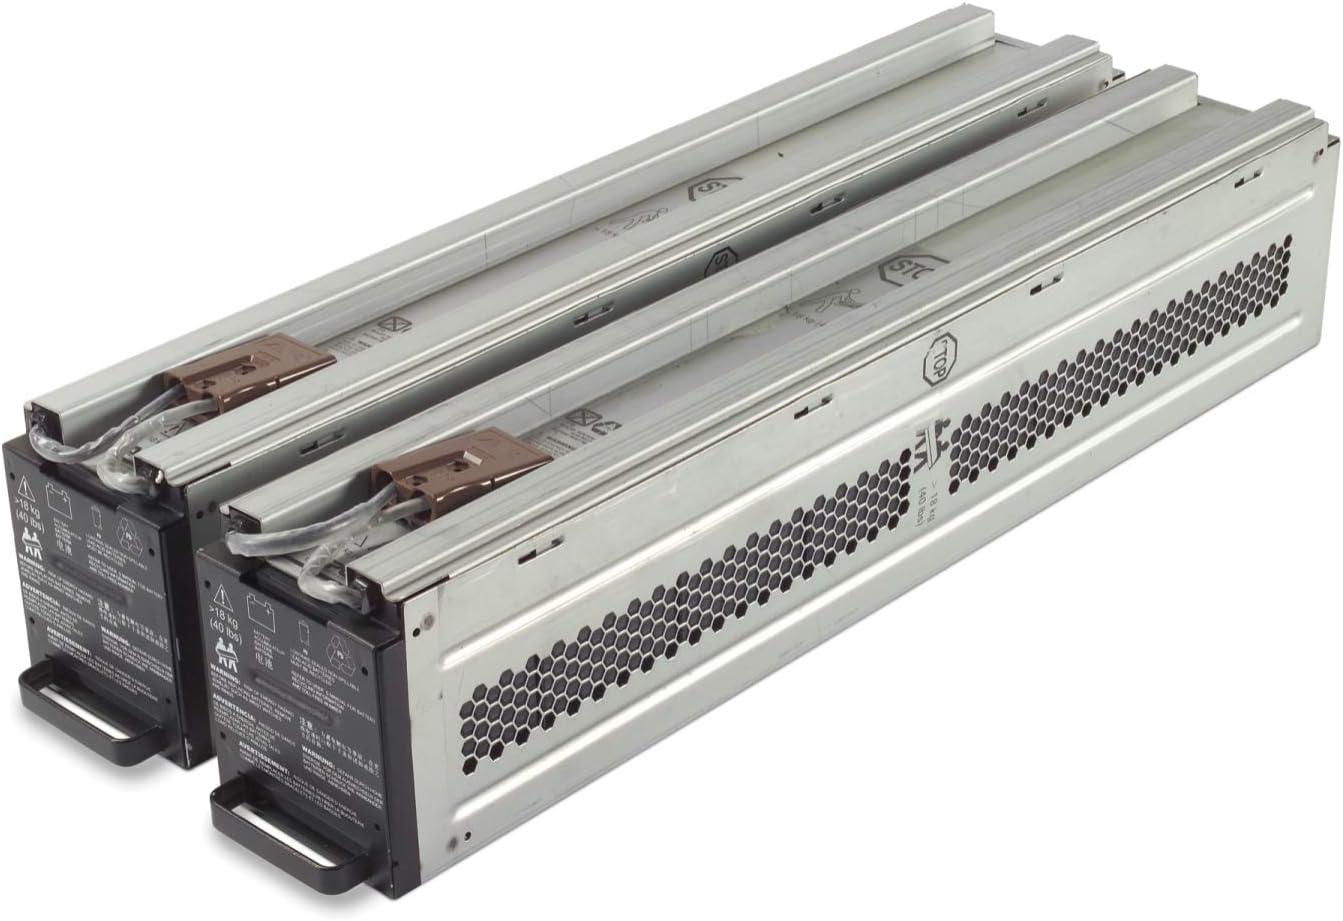 APC UPS Battery Replacement, APCRBC140, for APC Smart-UPS Models SRT10KRMXLI, SRT10KRMXLT, SRT10KRMXLT-10KTF, SRT10KXLI, SRT6KRMXLT, SRT6KXLT, SRT8KXLT